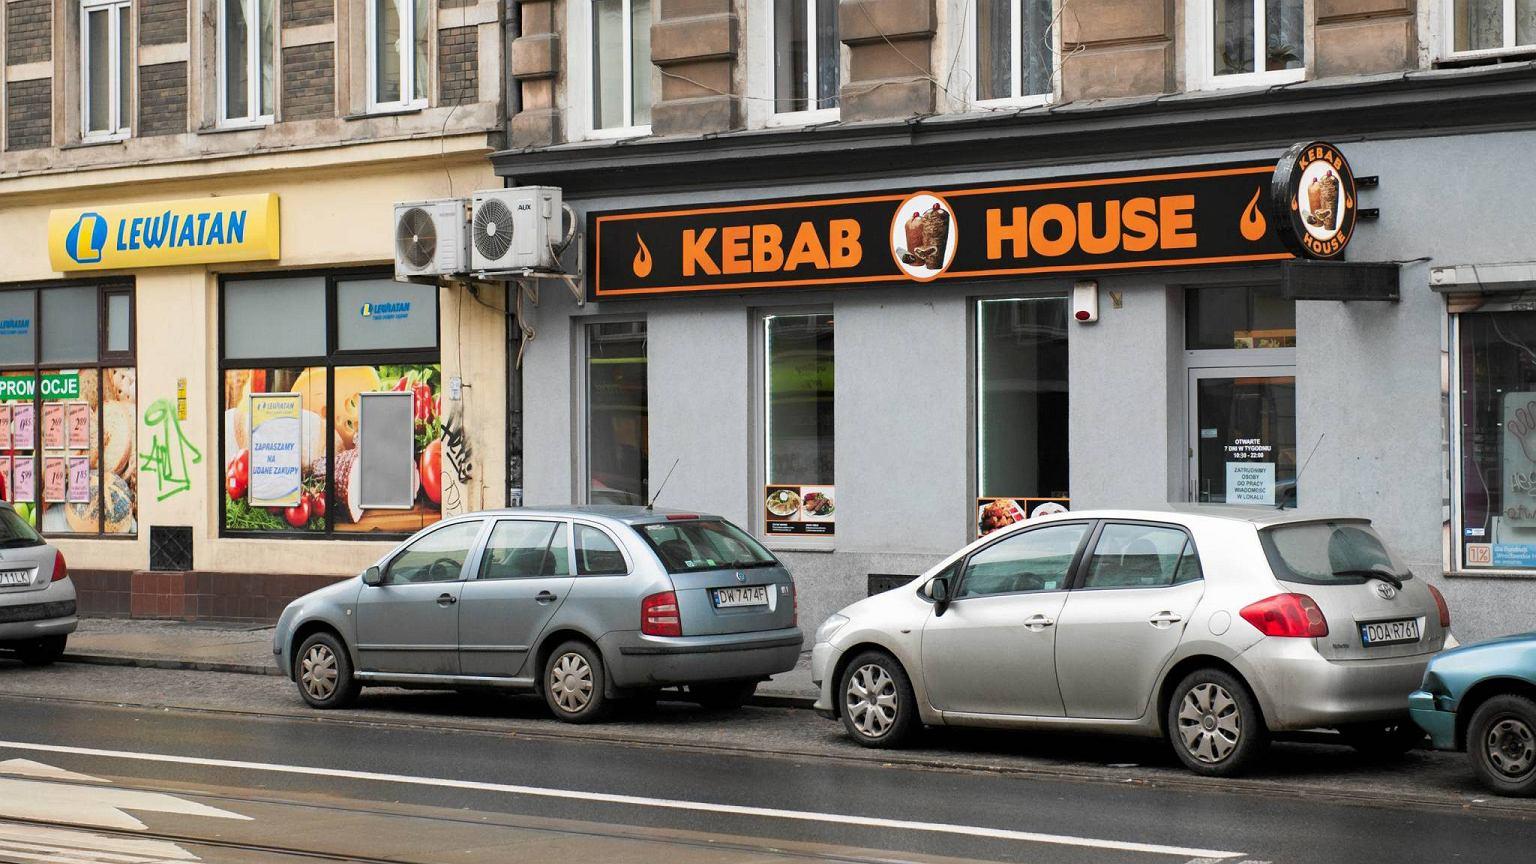 Atak na kebab wroc awianie chc pom c w a cicielowi for Classic kebab house stechford